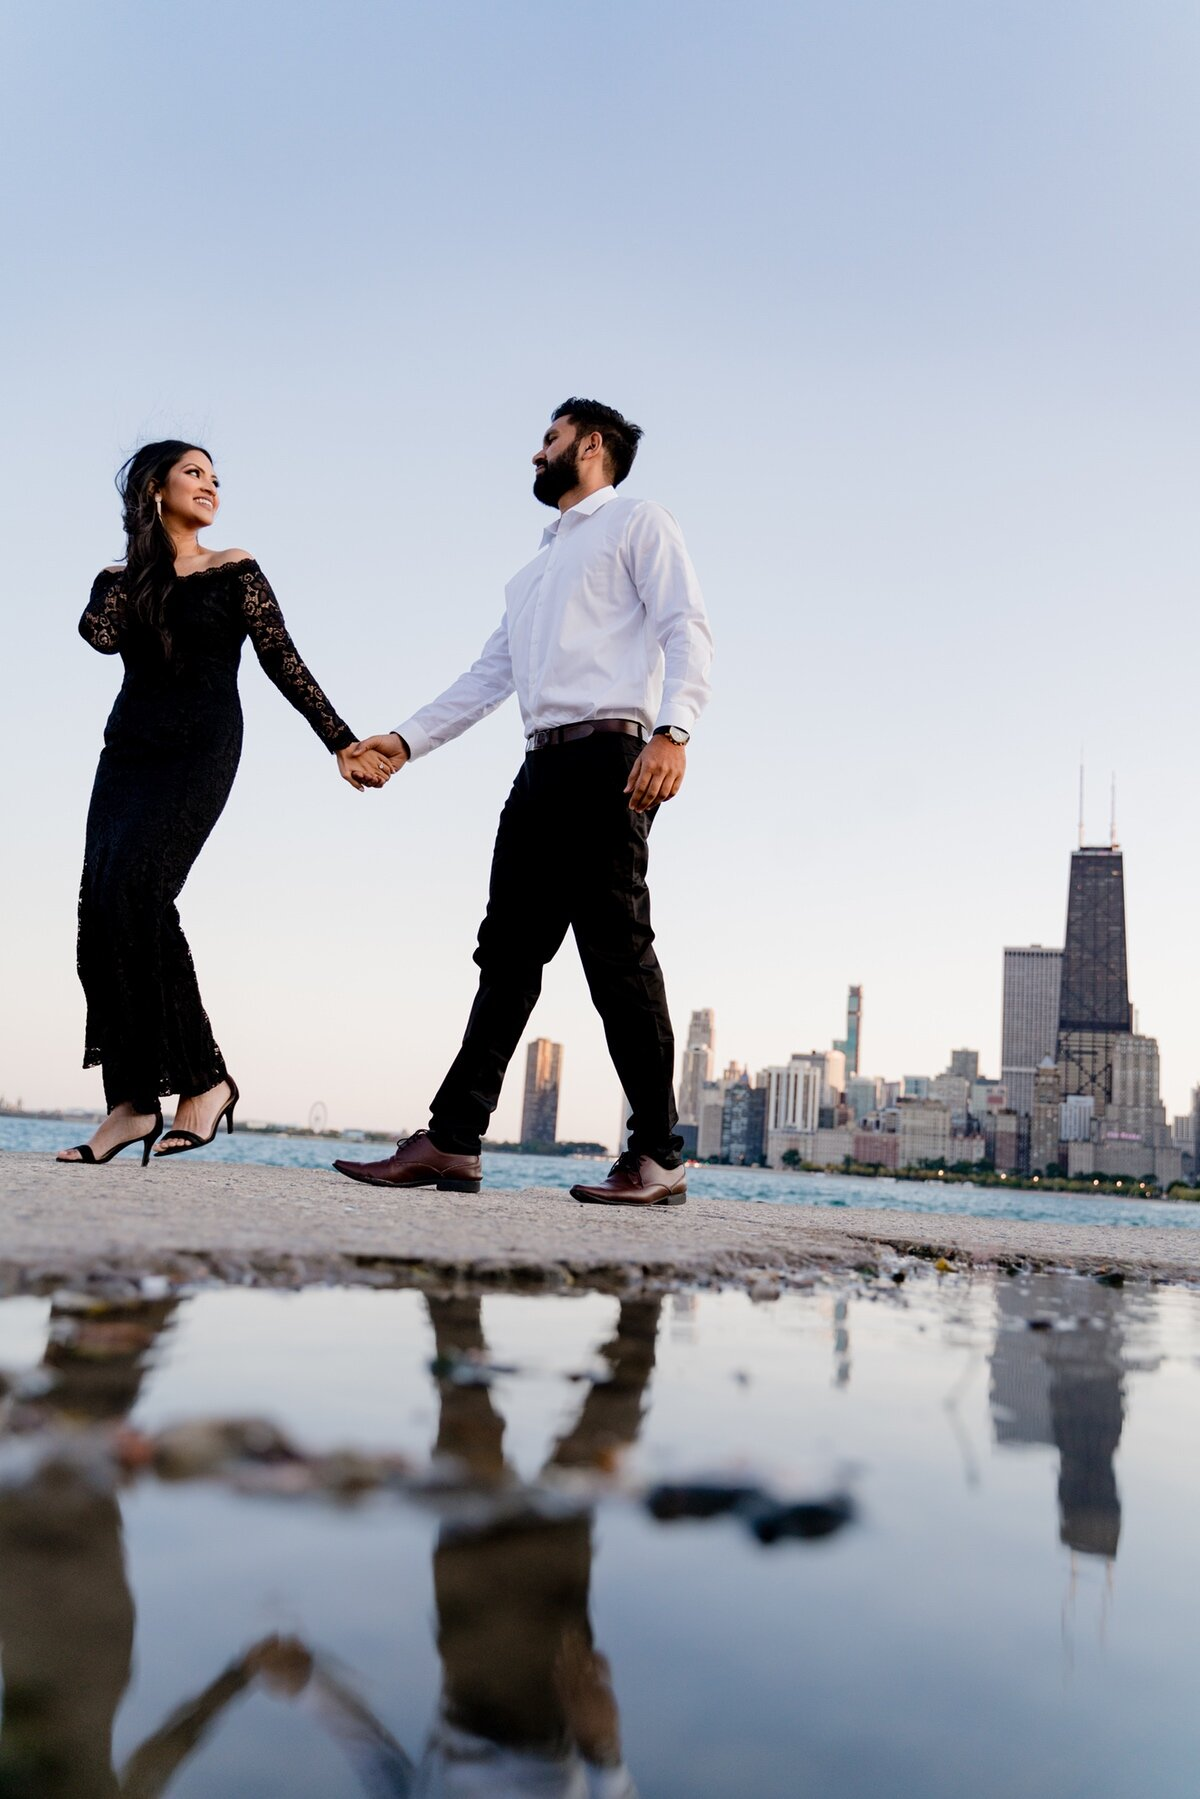 Le Cape Weddings - Chicago Engagement Session - Joann and Bensen -34.jpg